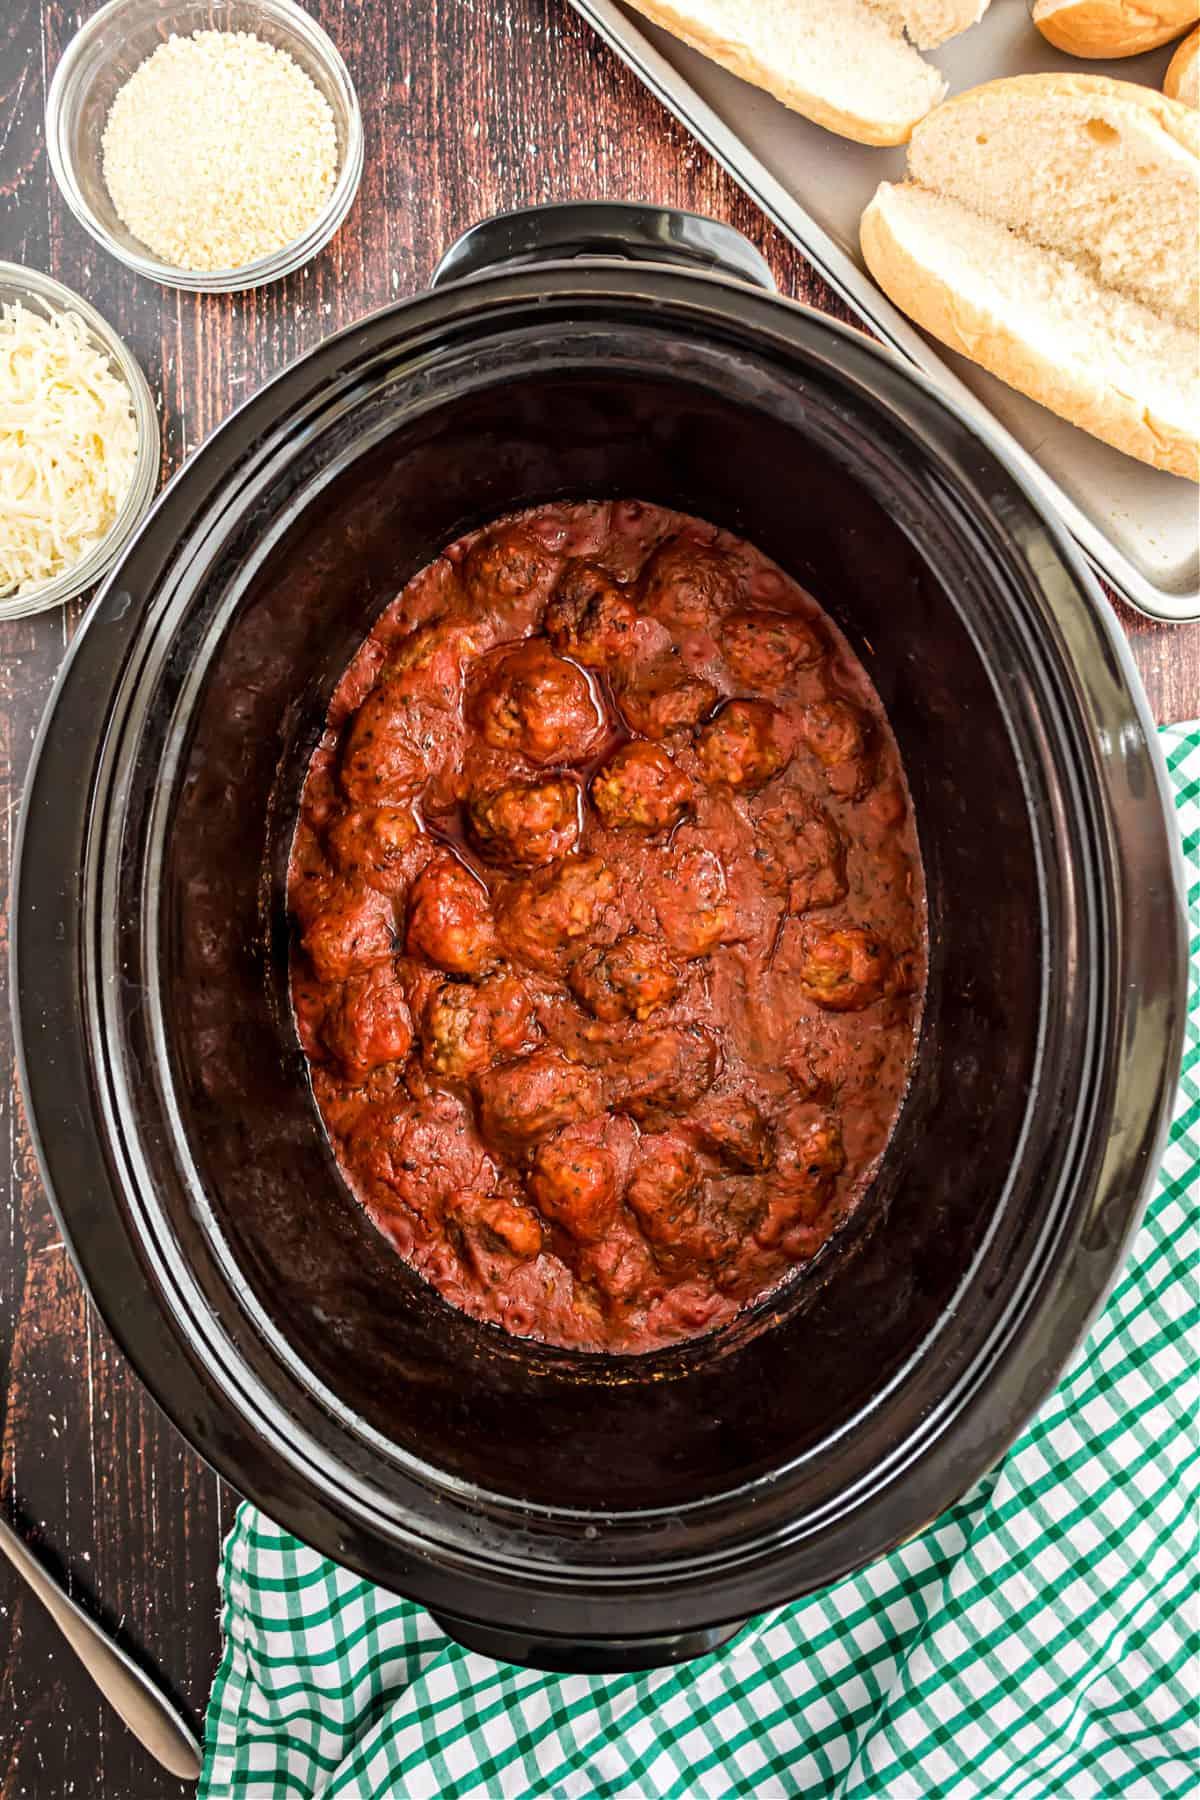 Meatballs in marinara sauce in crockpot.